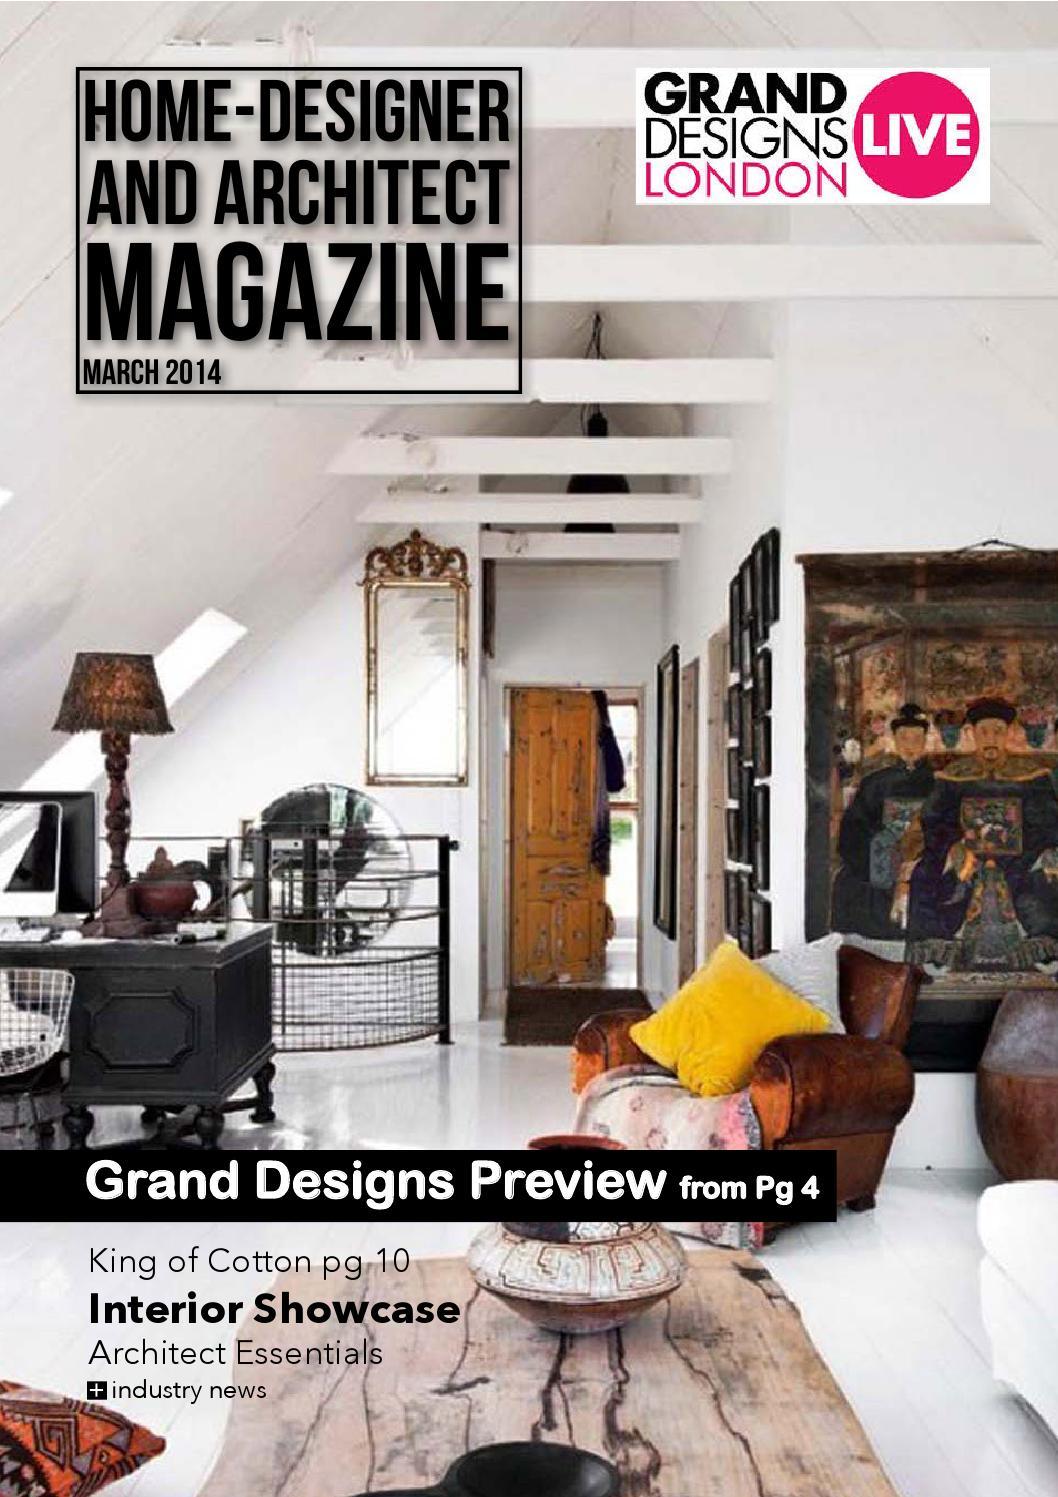 Home Designer & Architect by Jet Digital Media Ltd - issuu